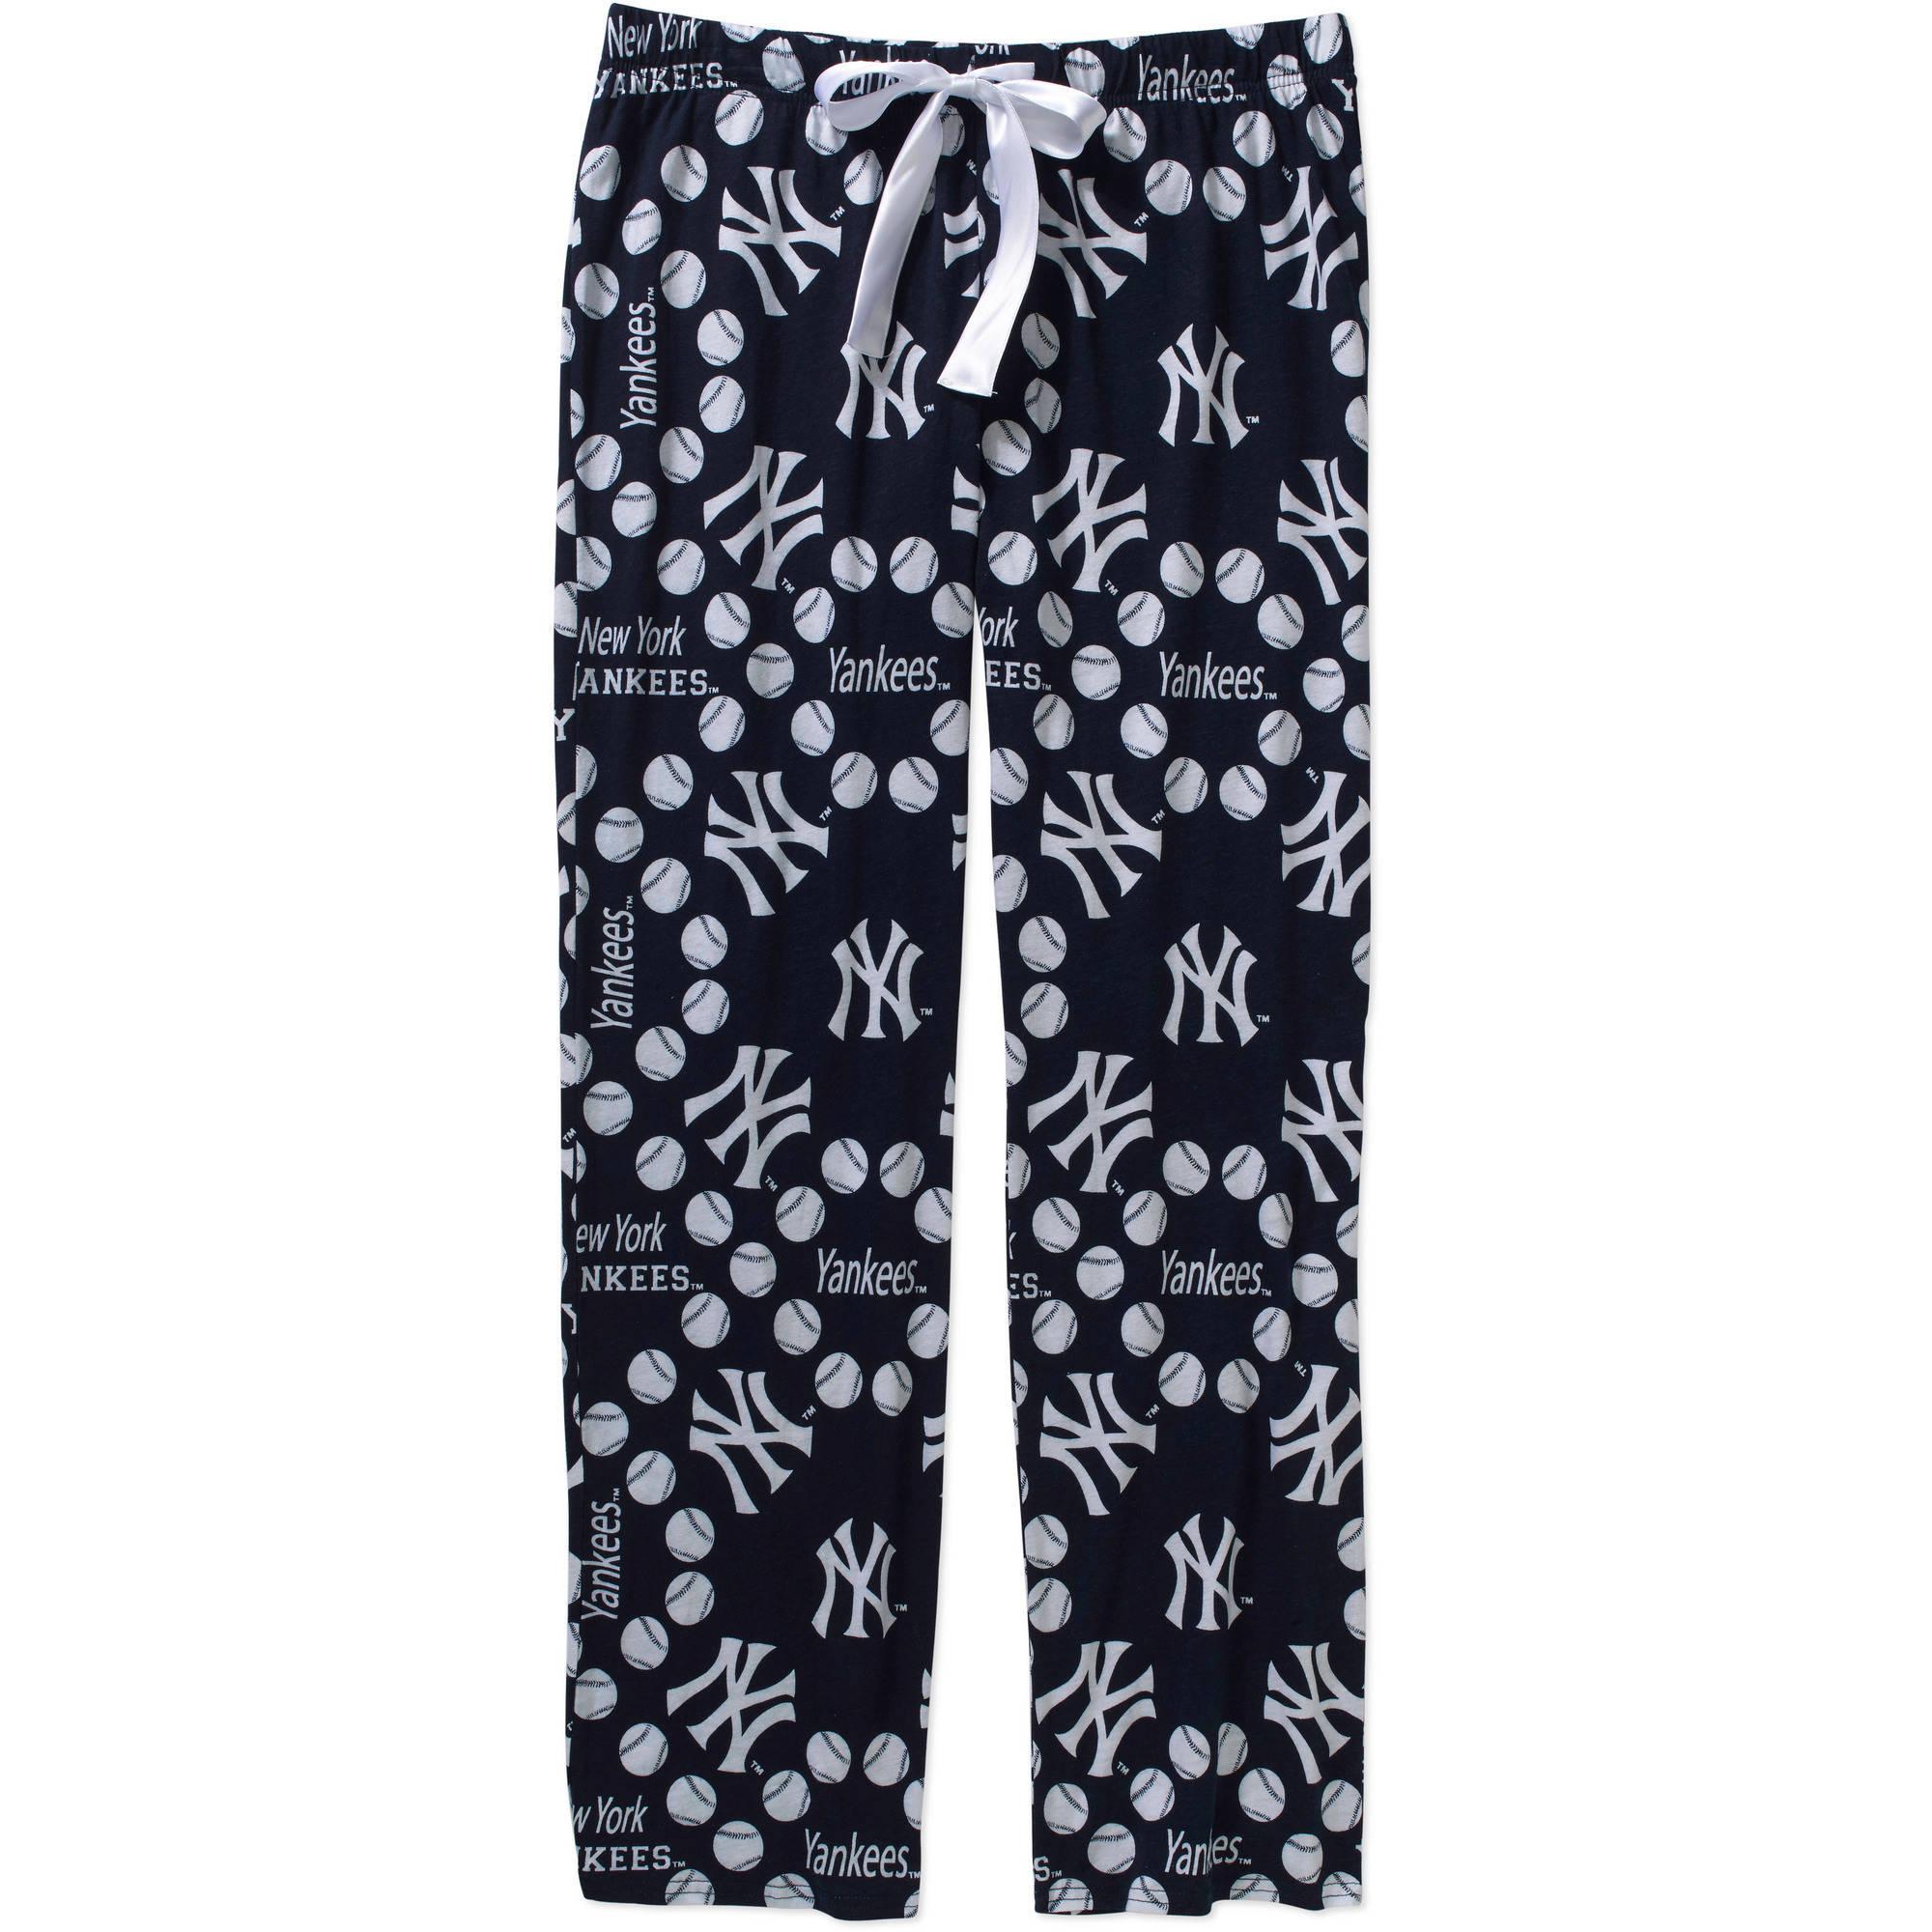 MLB Women's New York Yankees Knit Sleep Pants